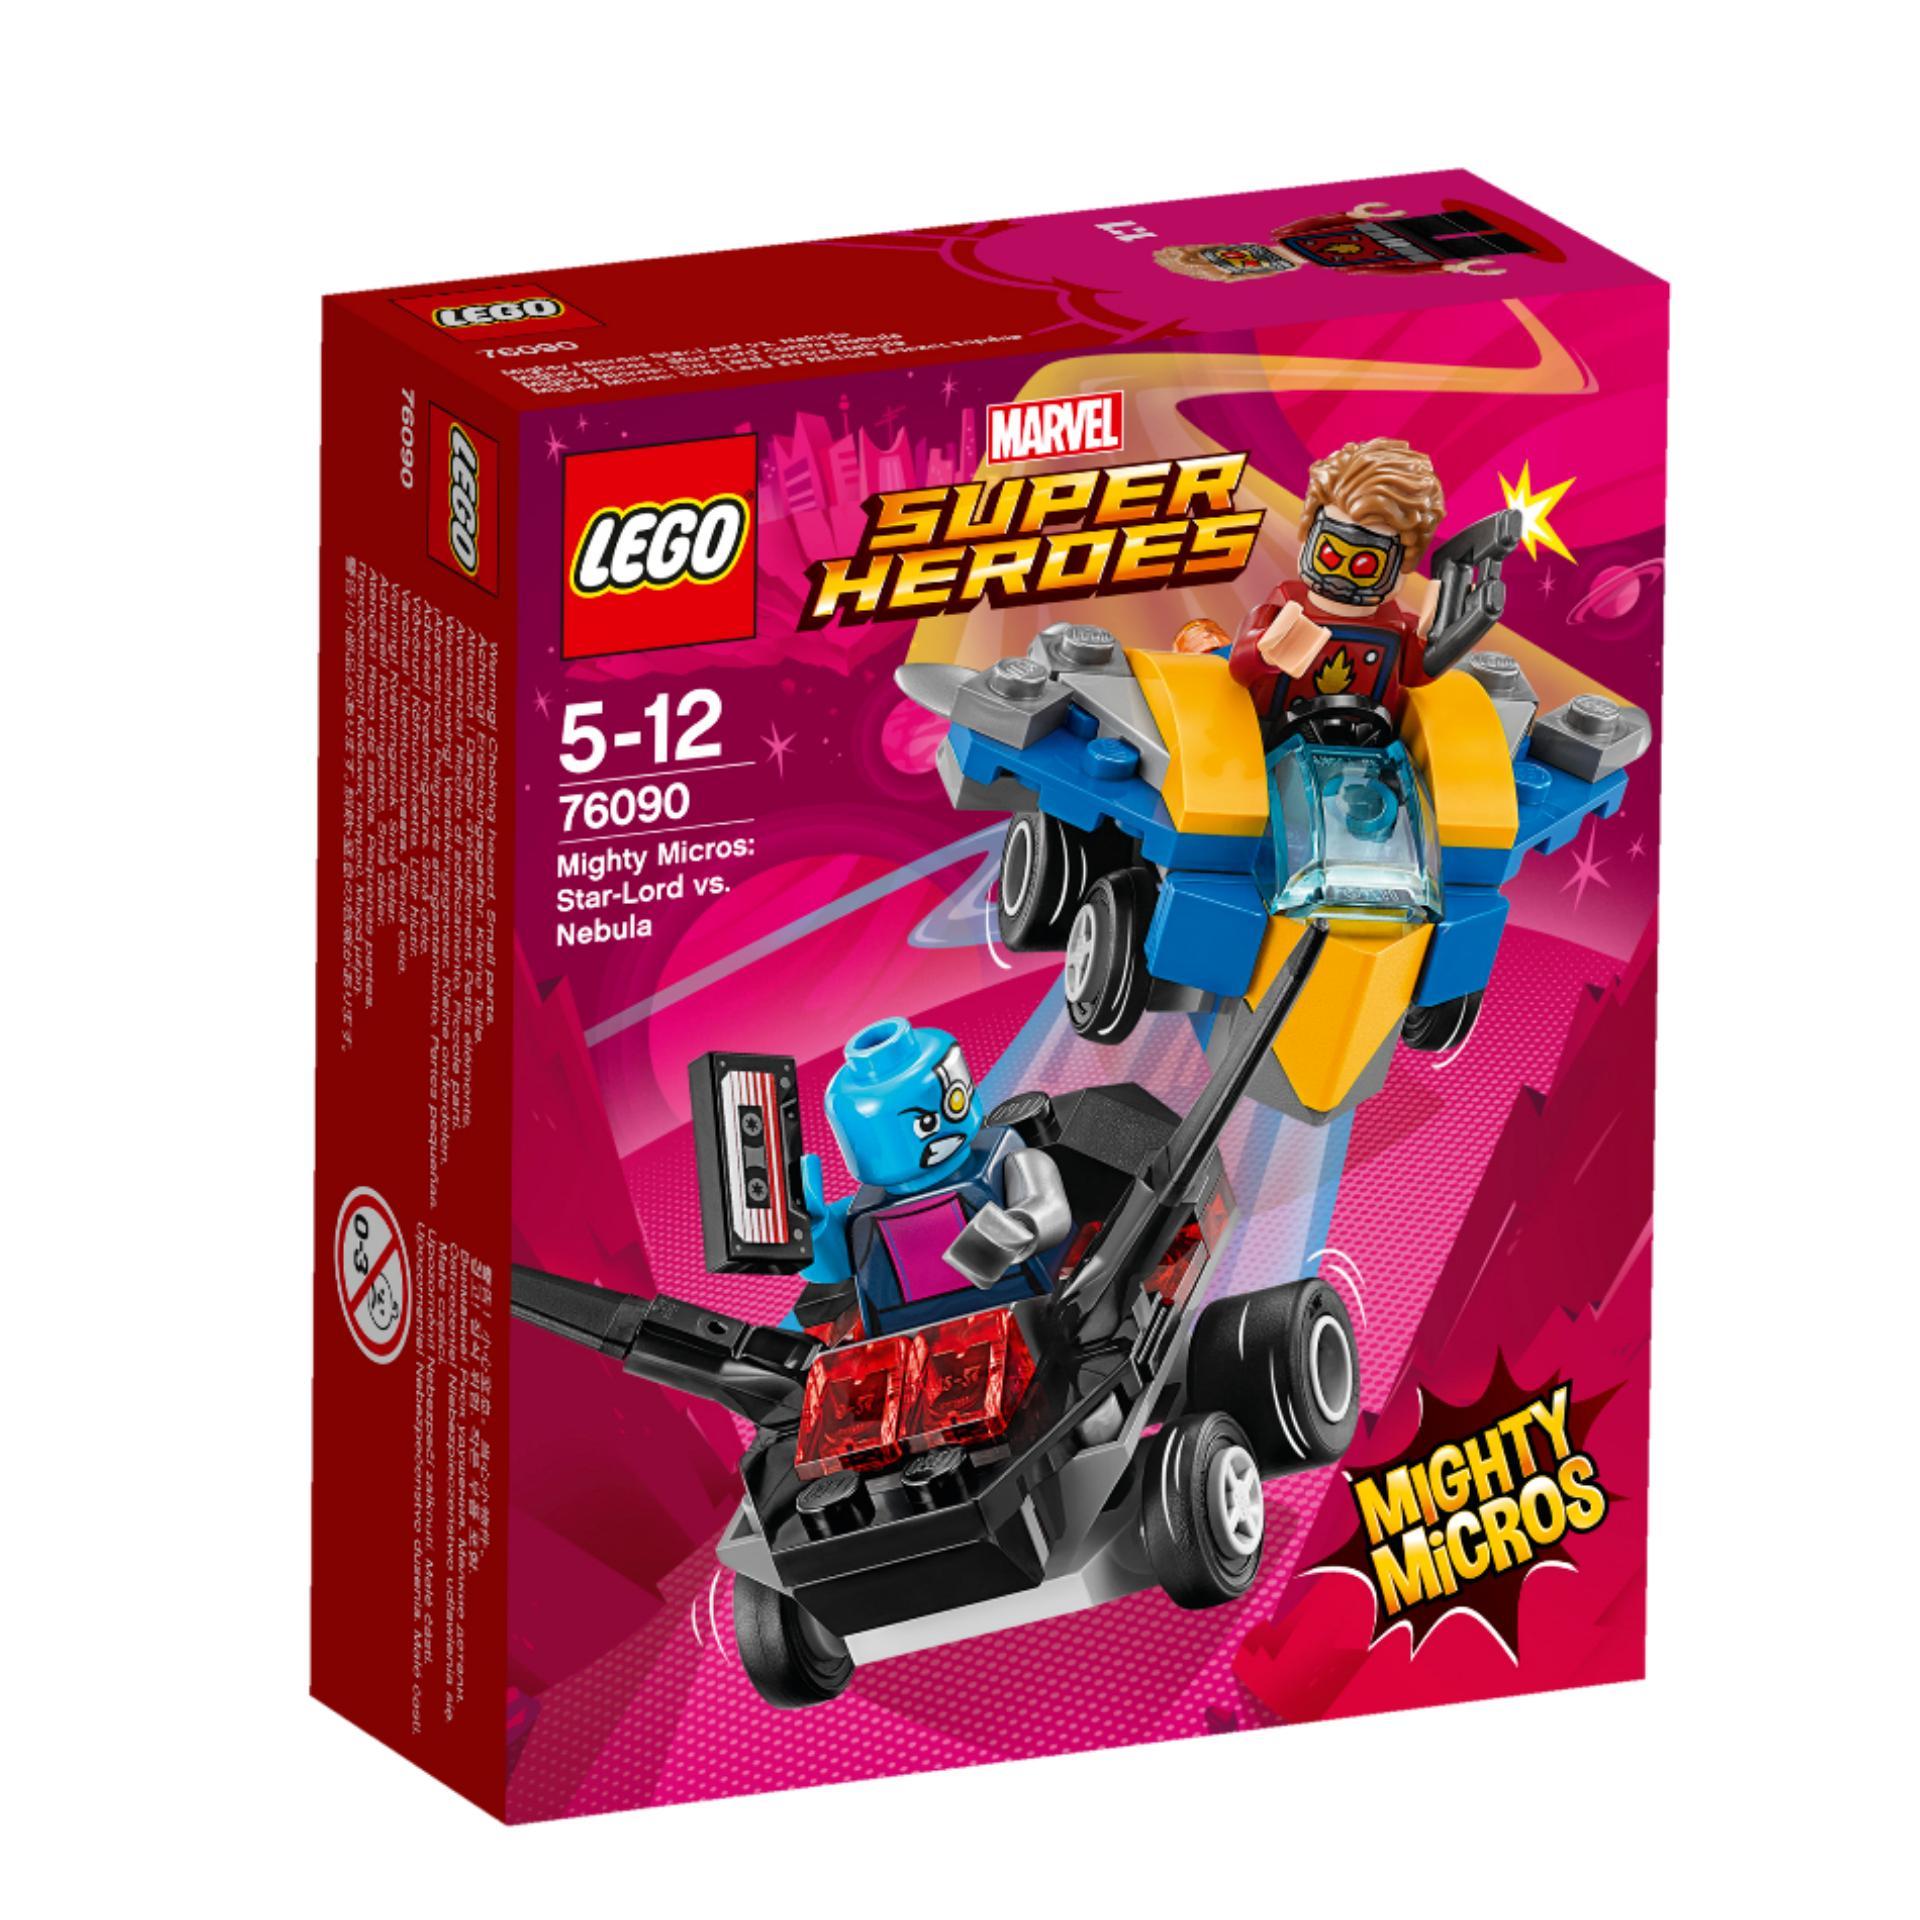 LEGO Marvel Super Heroes Mighty Micros Star Lord vs Nebula